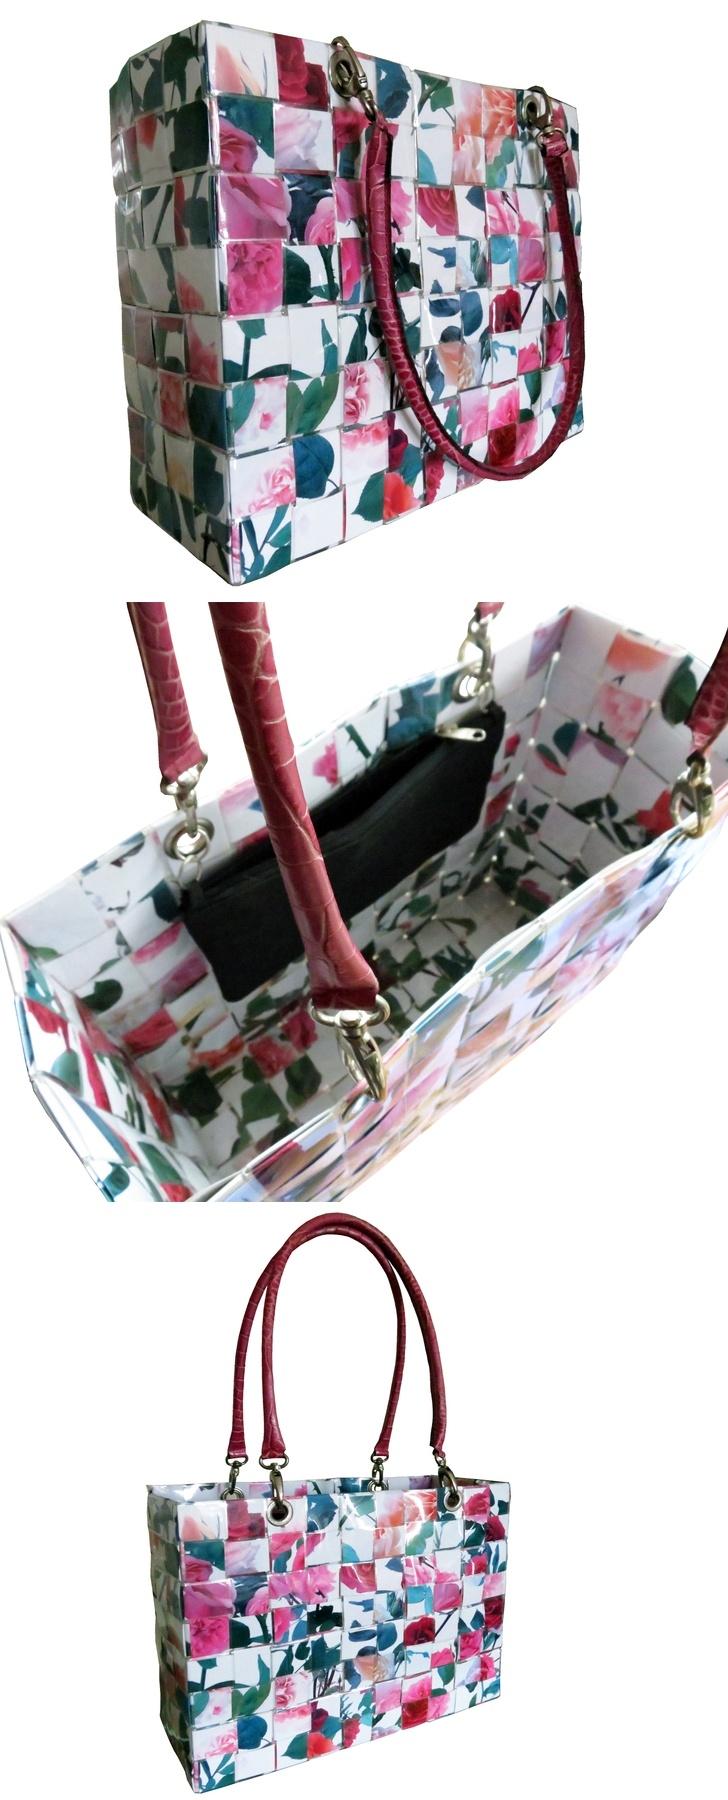 Borsa shopper creata con immagini di rose // Shopper bag created with rose pictures by CeeBee-recycle via it.dawanda.com #upcycling